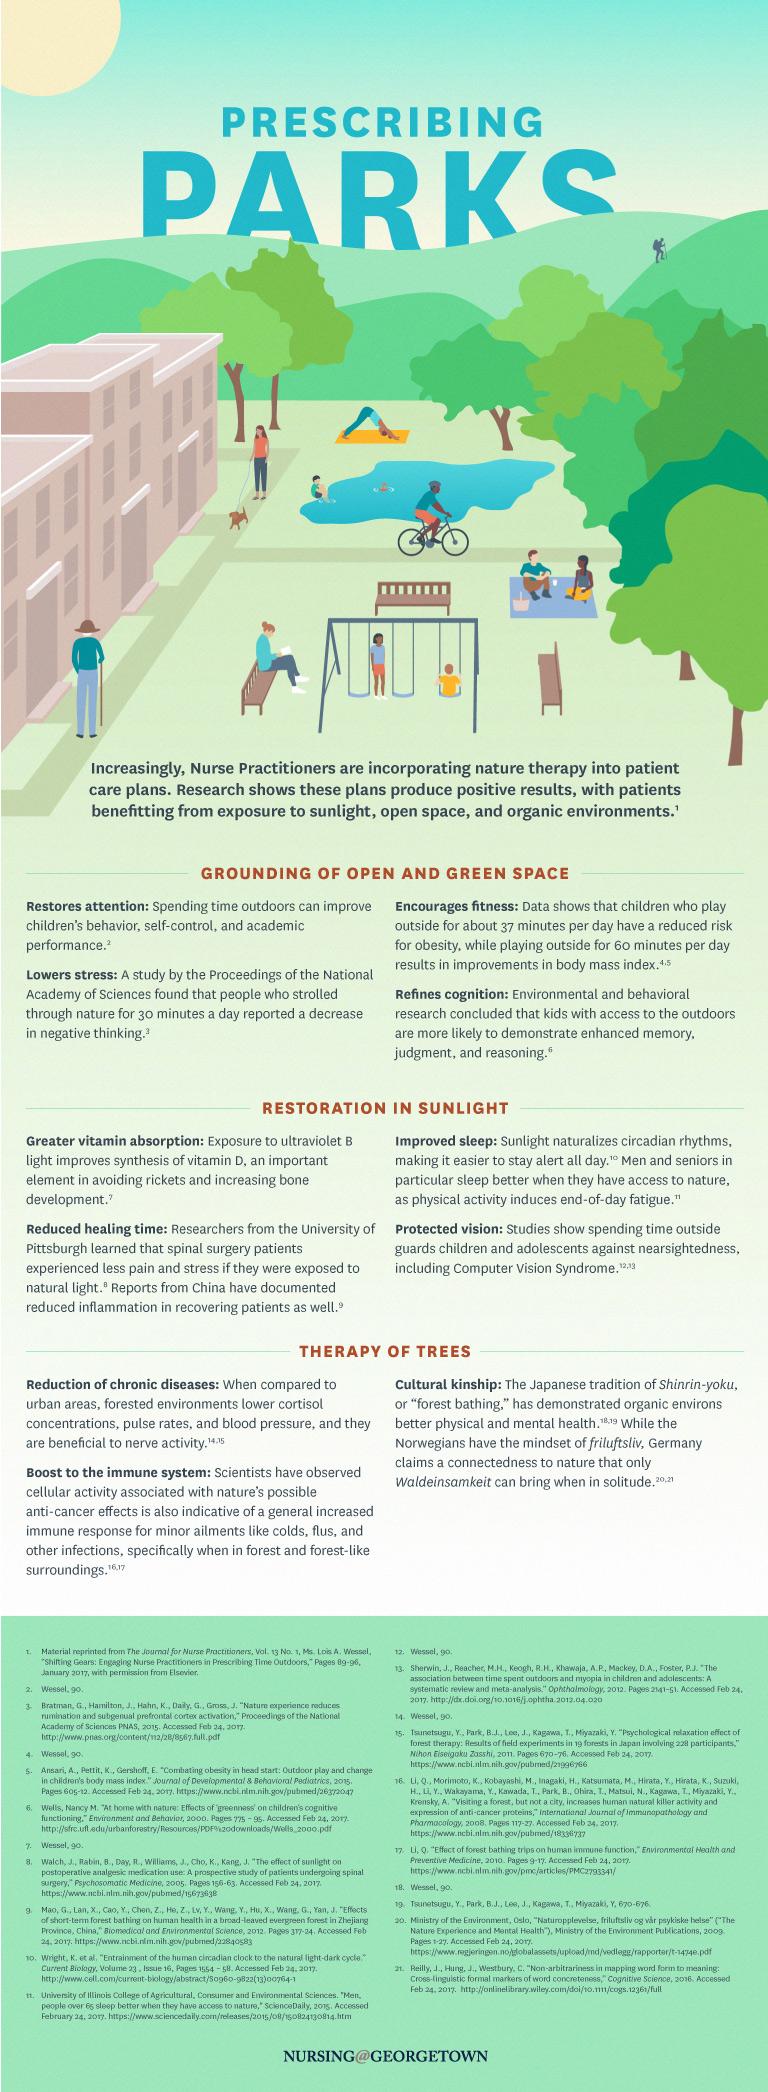 Prescribing Parks Infographic